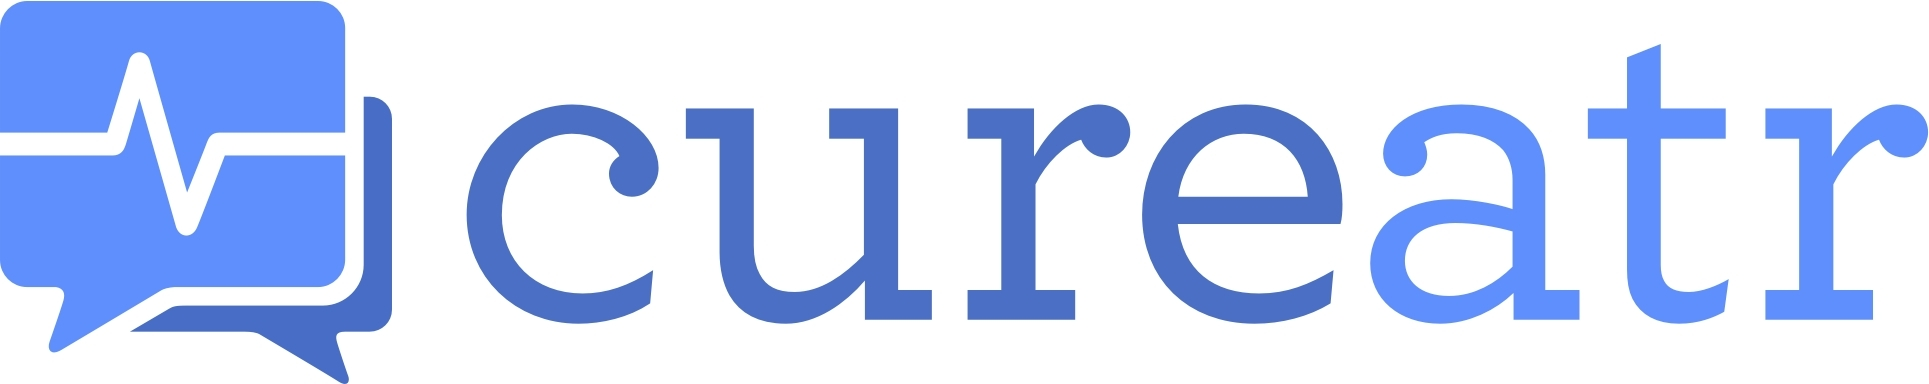 Cureatr_Large_Logo.jpg